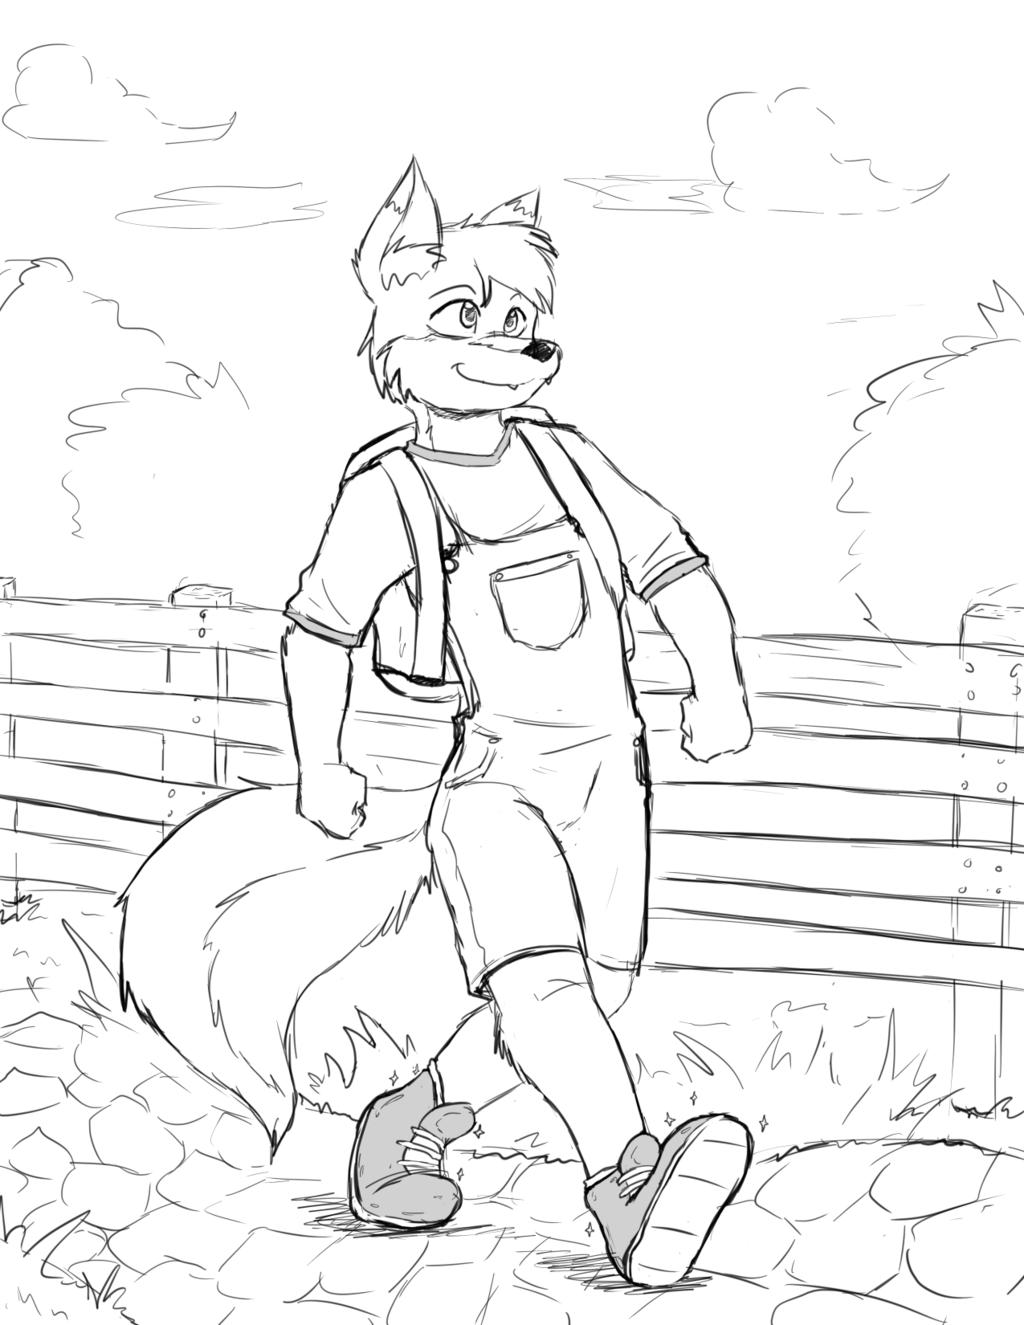 (Commission) - Crisp the Wolf